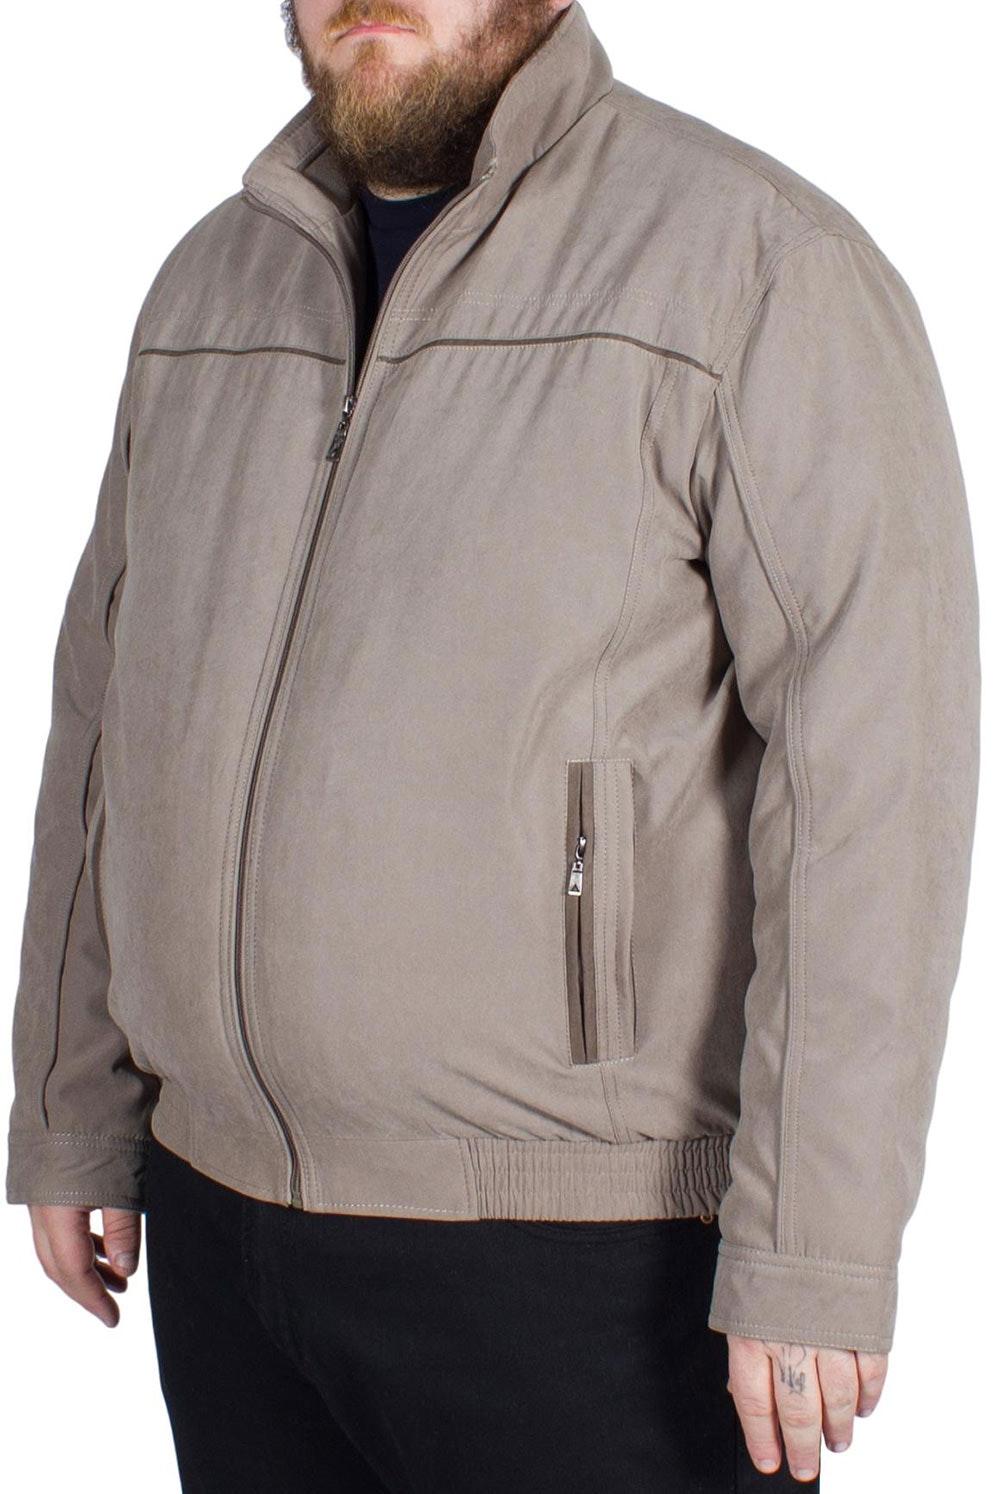 Saxon Mull Jacket Beige